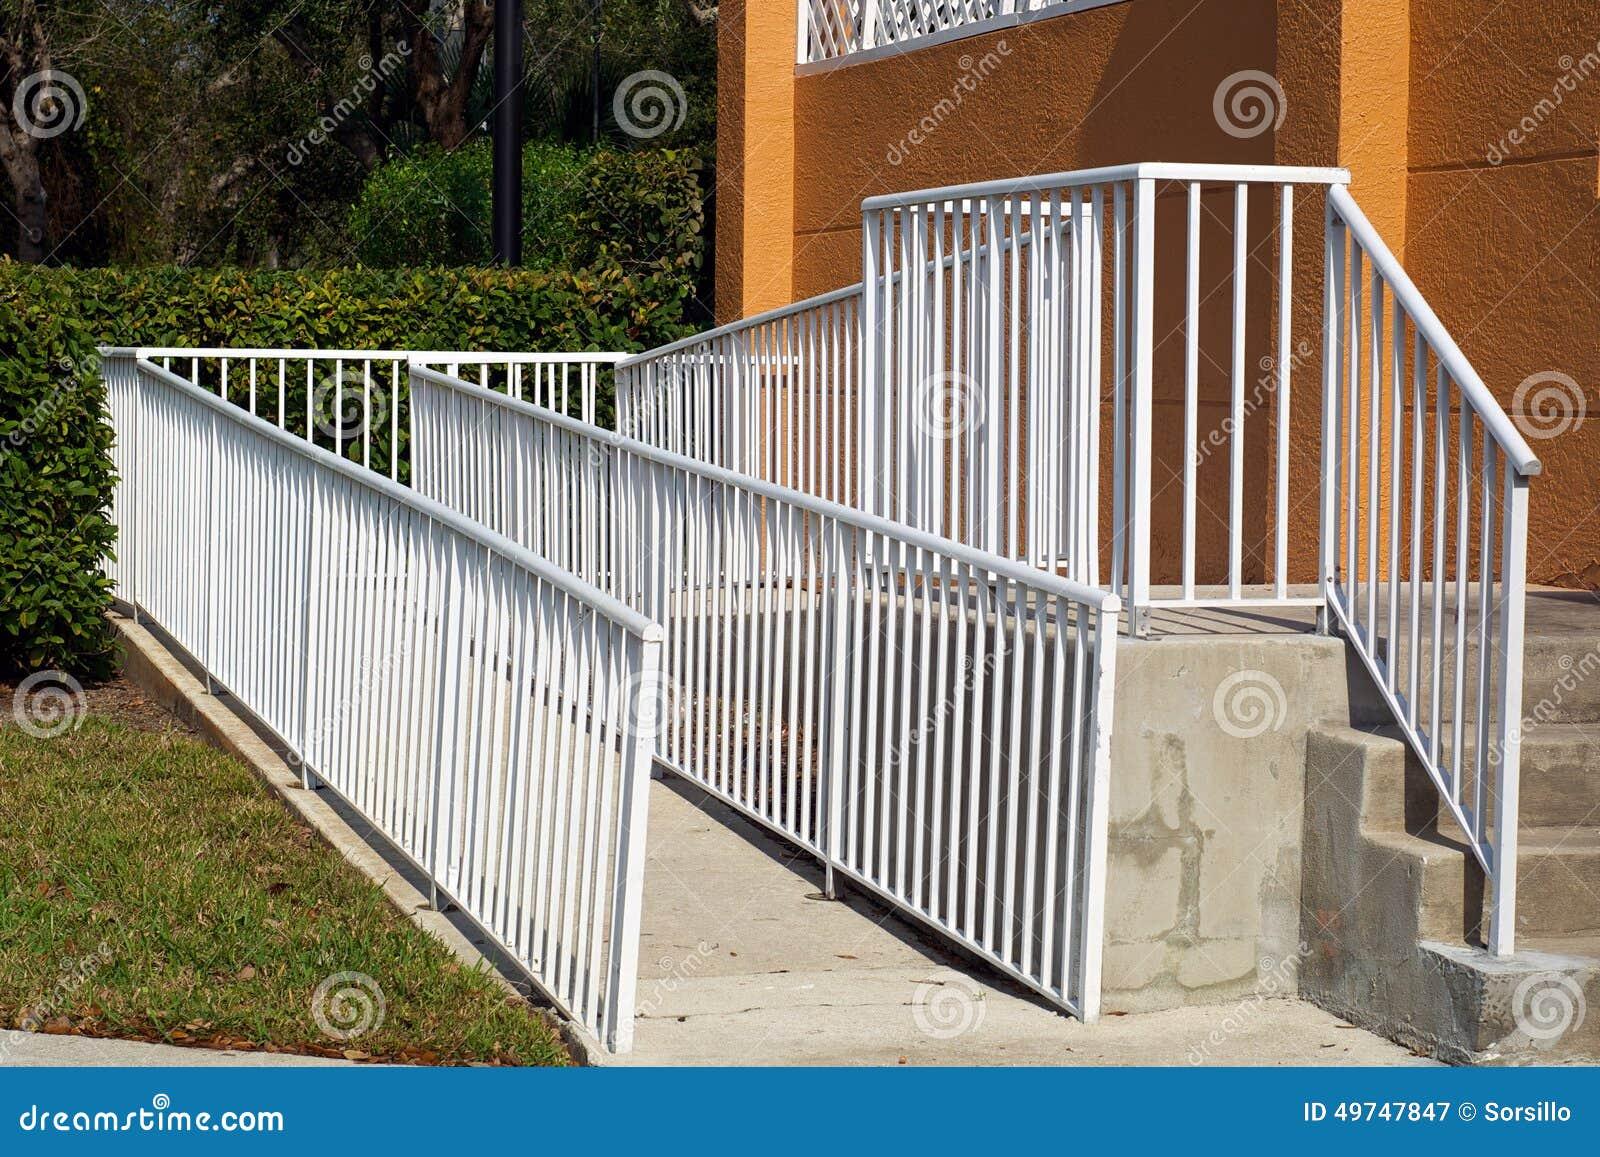 Handicap Ramp With White Railing Stock Image - Image of ...